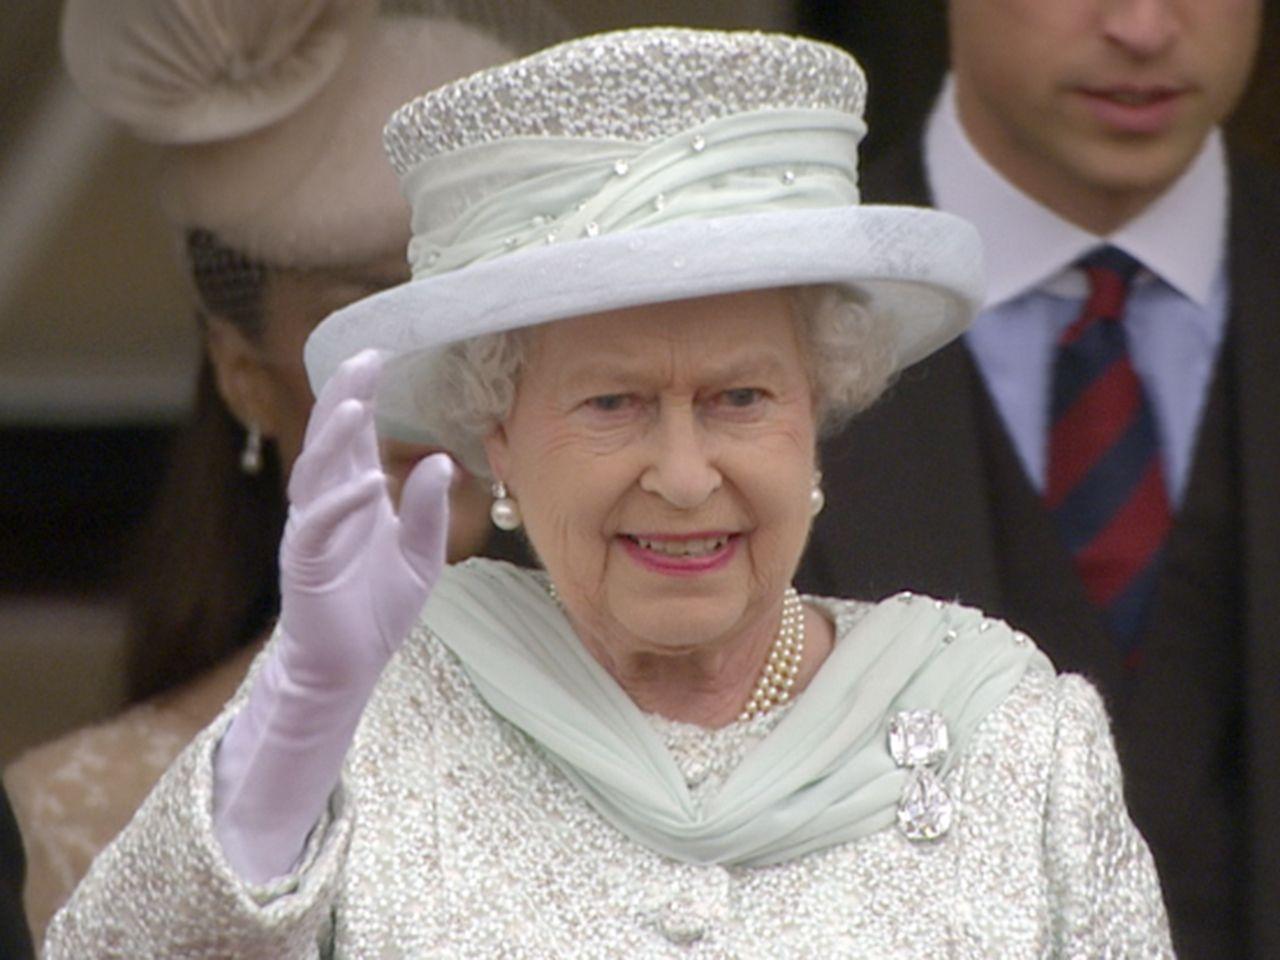 Queen Elizabeth celebrates 60th coronation anniversary